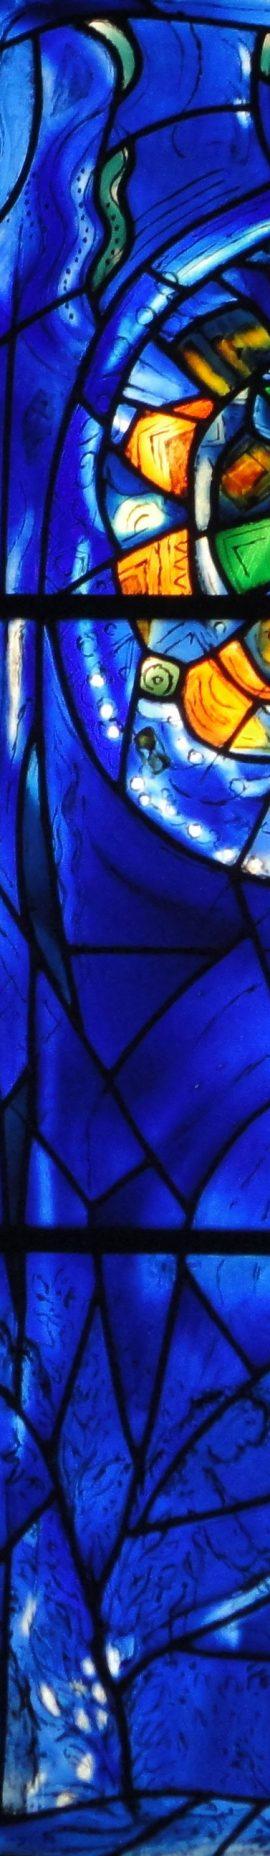 window-glass-museum-3.jpg